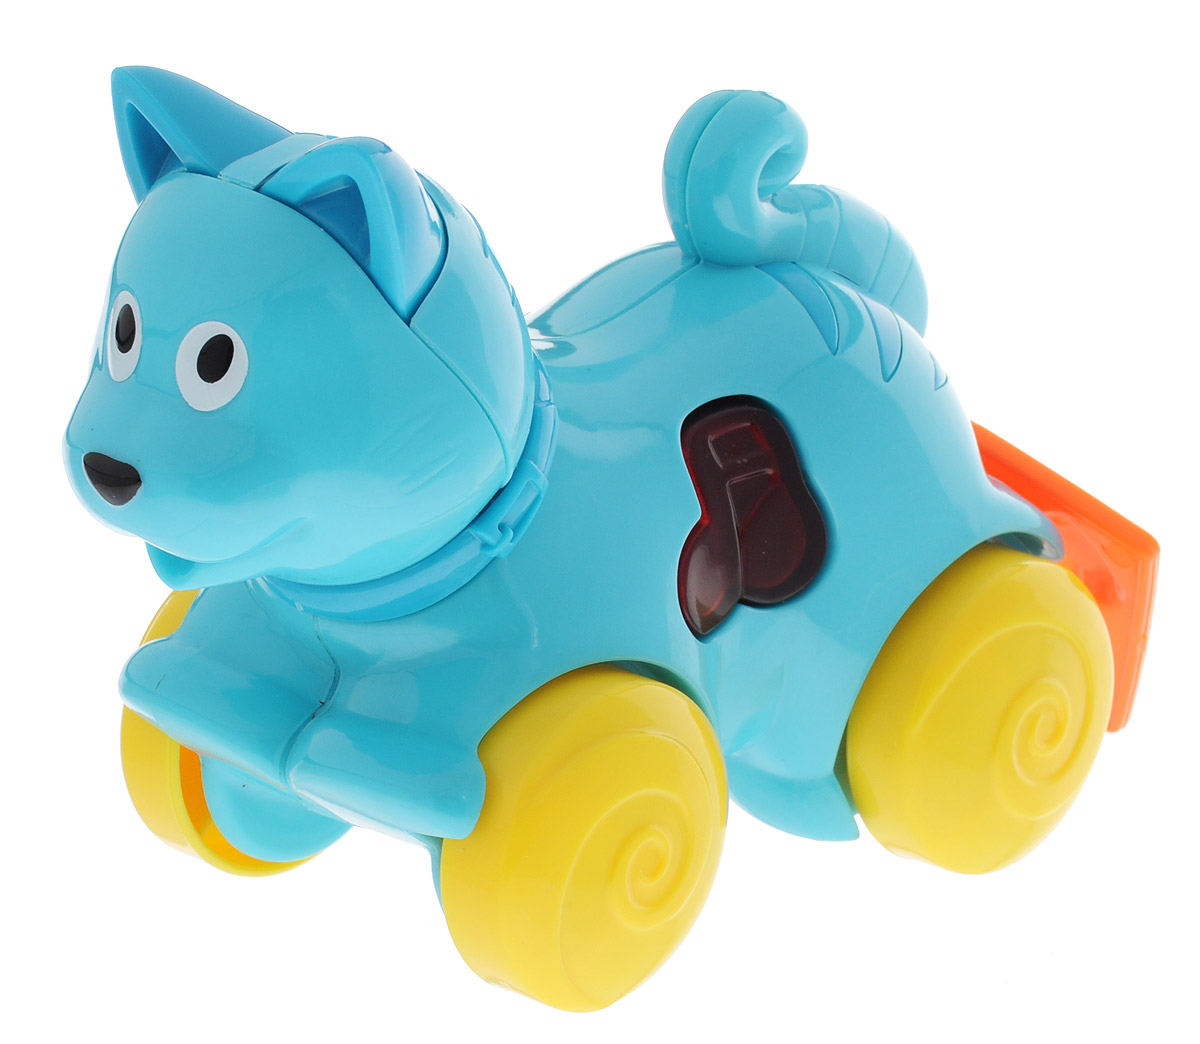 Navystar Музыкальная игрушка-каталка Котик т а курышева музыкальная журналистика и музыкальная критика